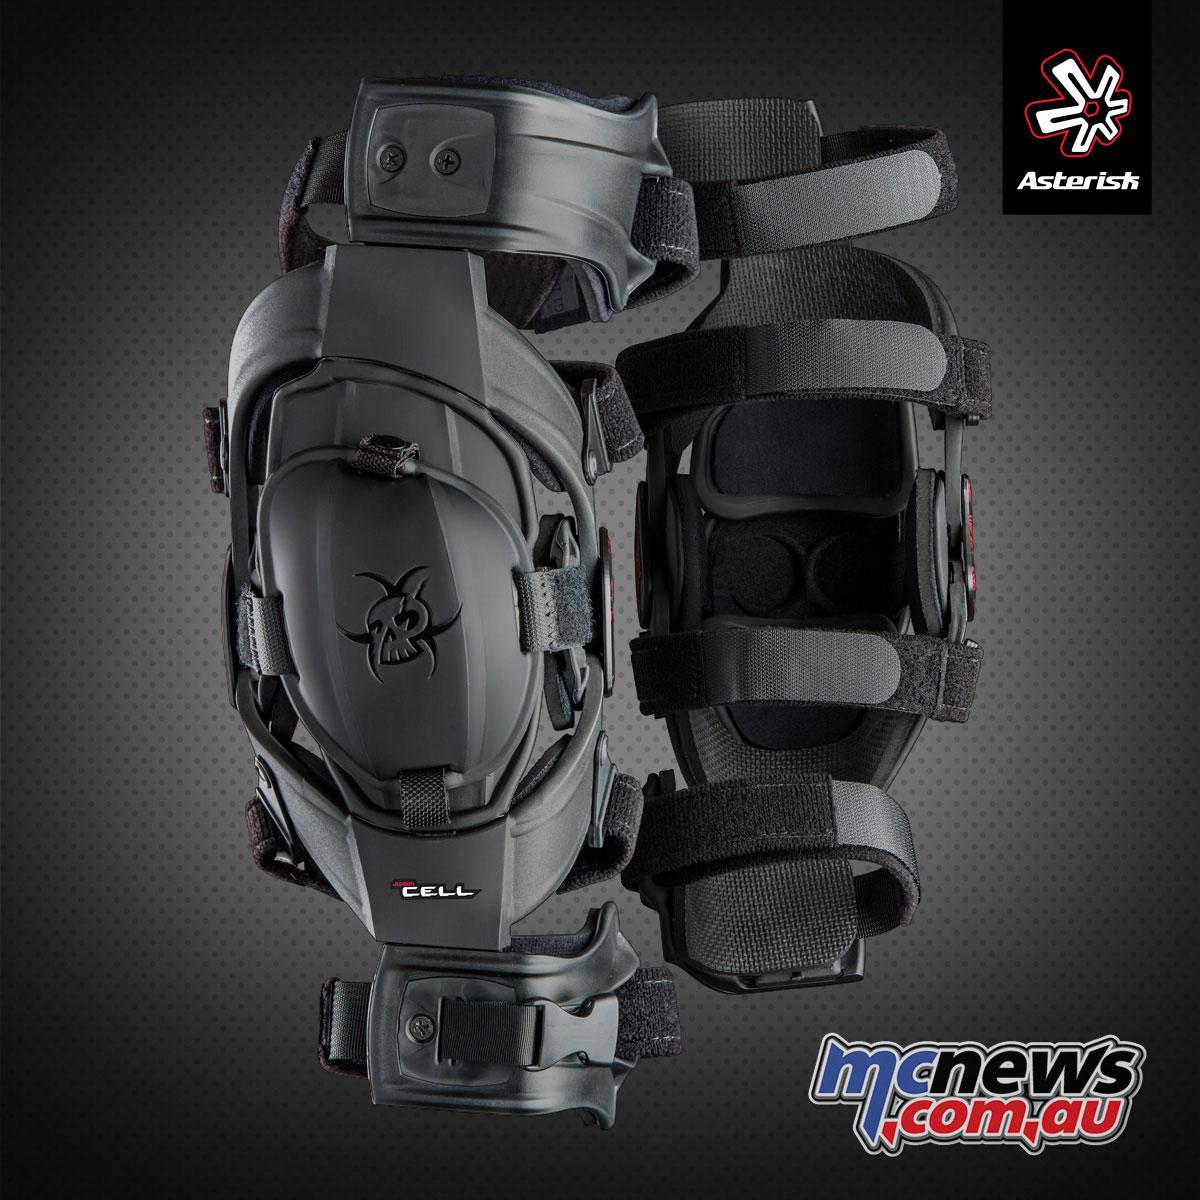 Asterisk Knee Braces designed for Juniors   $499.95